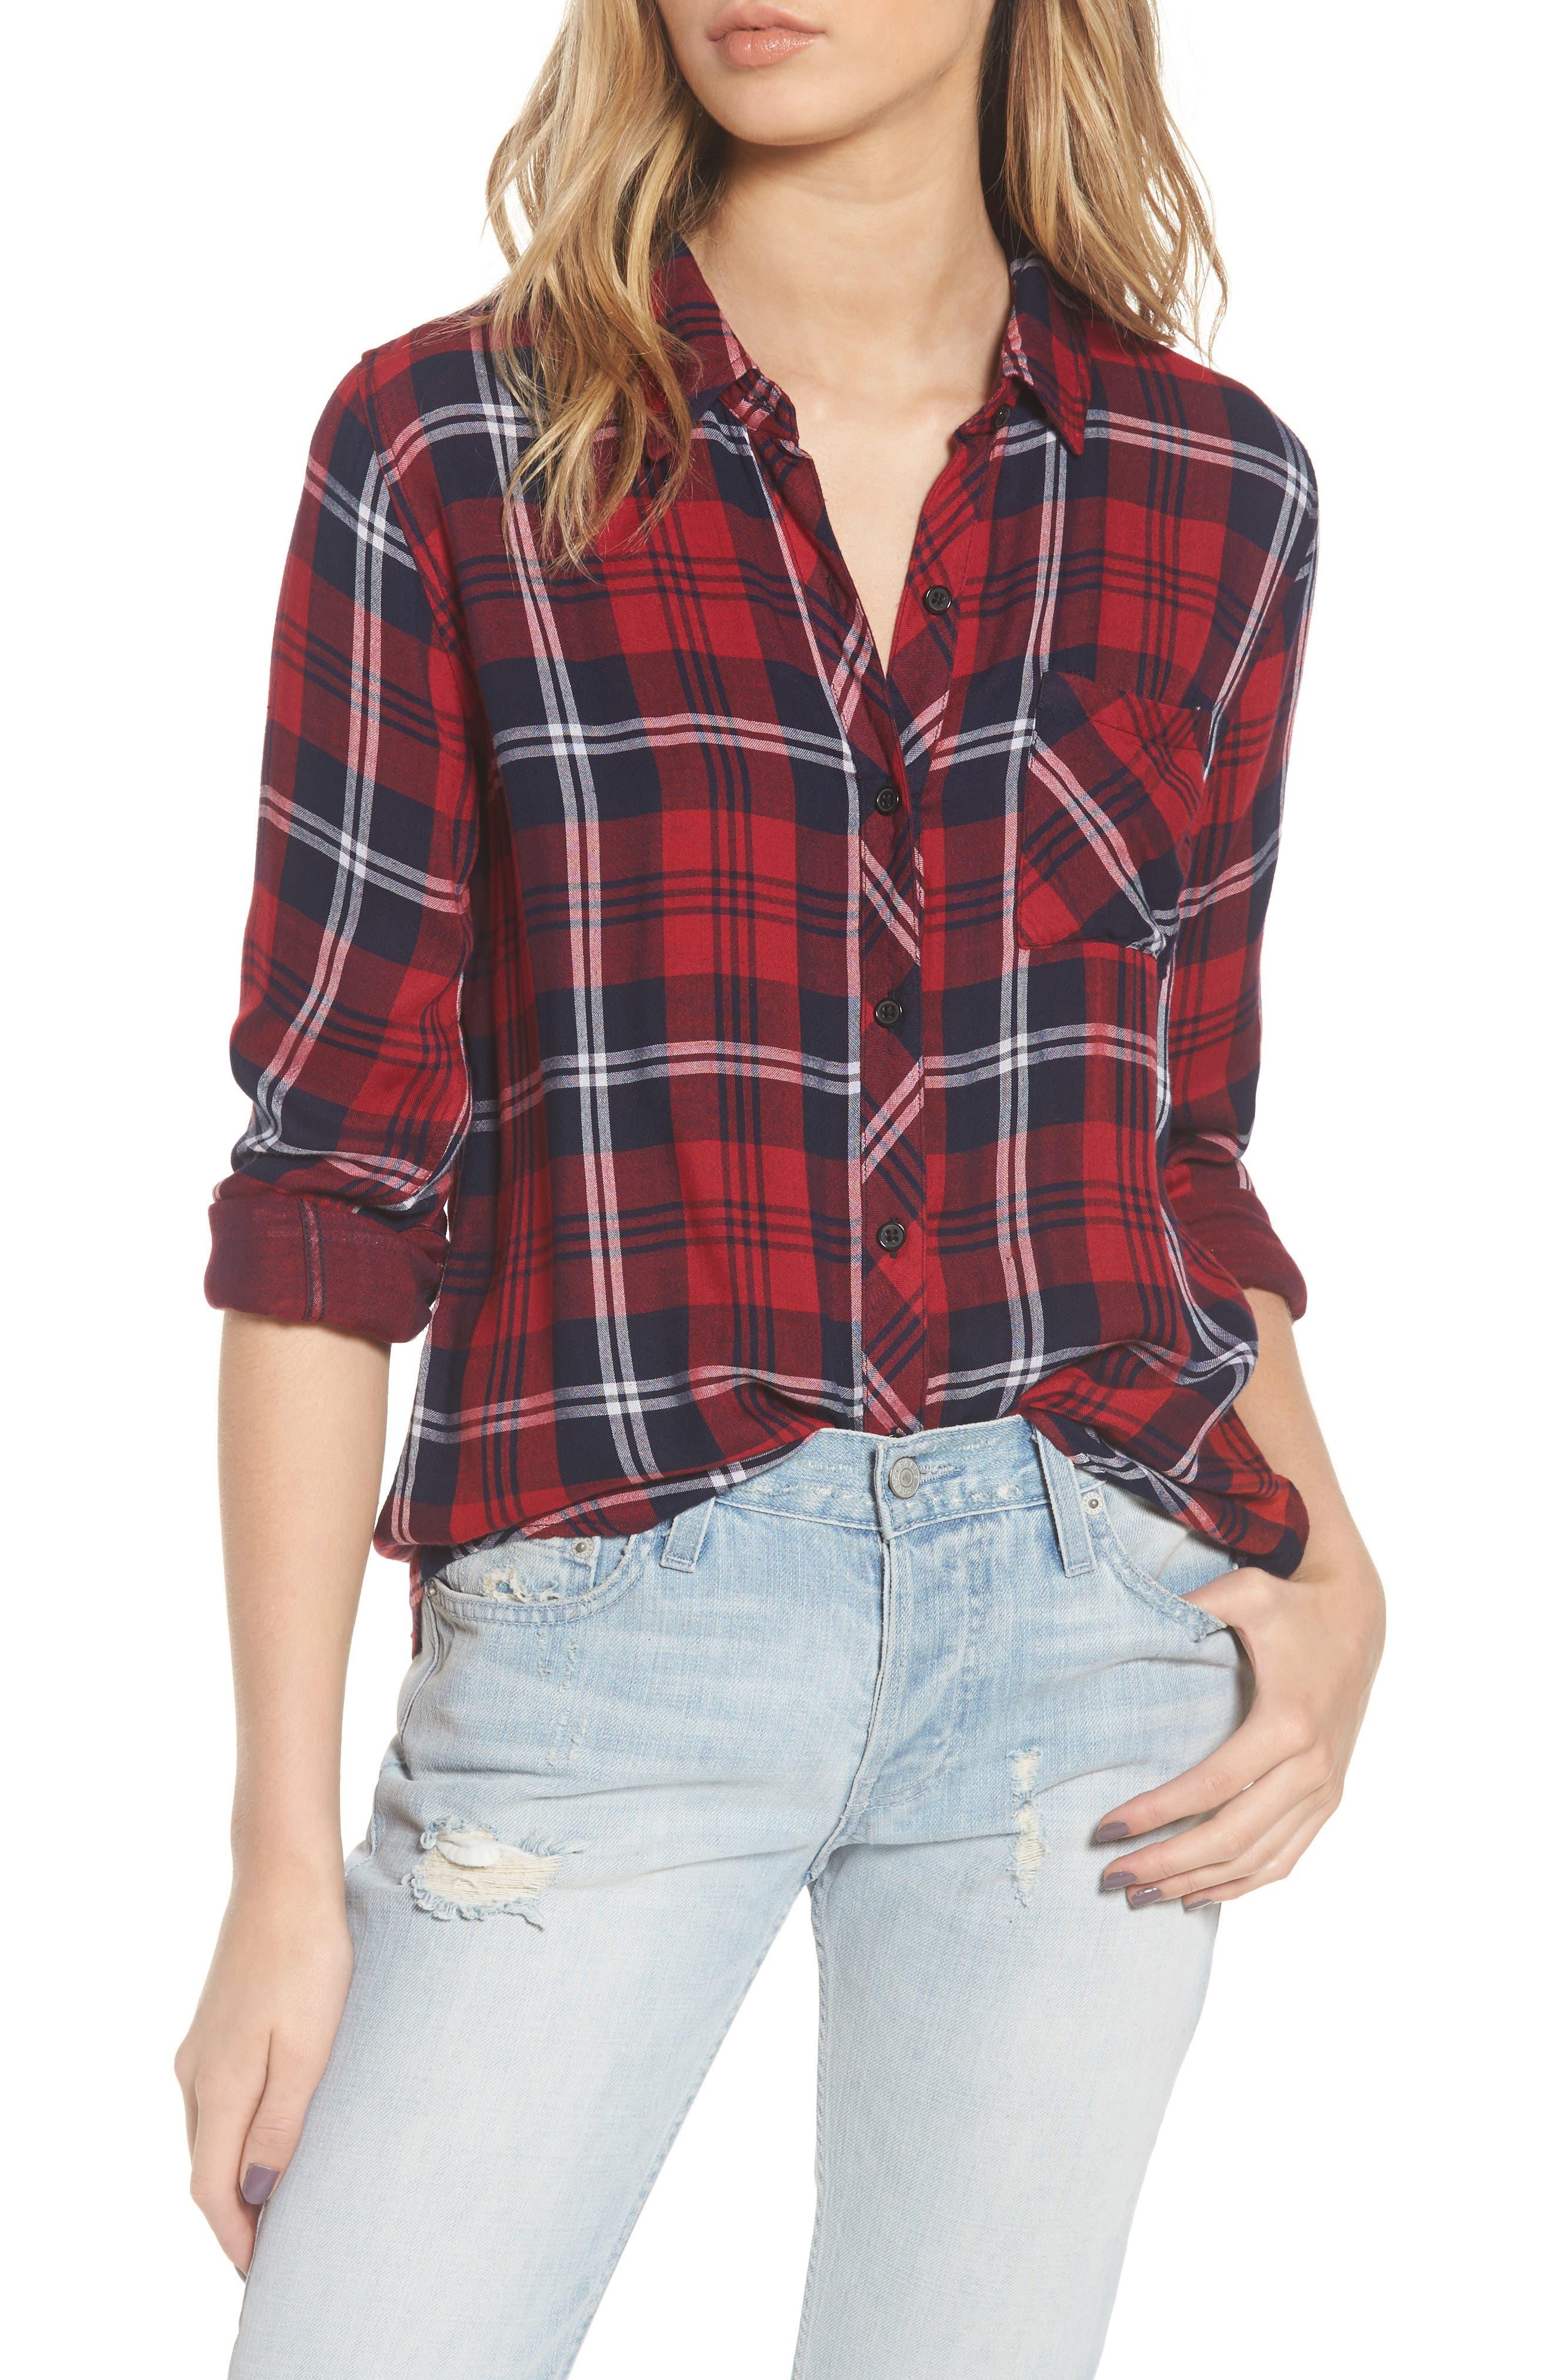 Alternate Image 1 Selected - Rails Taitum Plaid Shirt